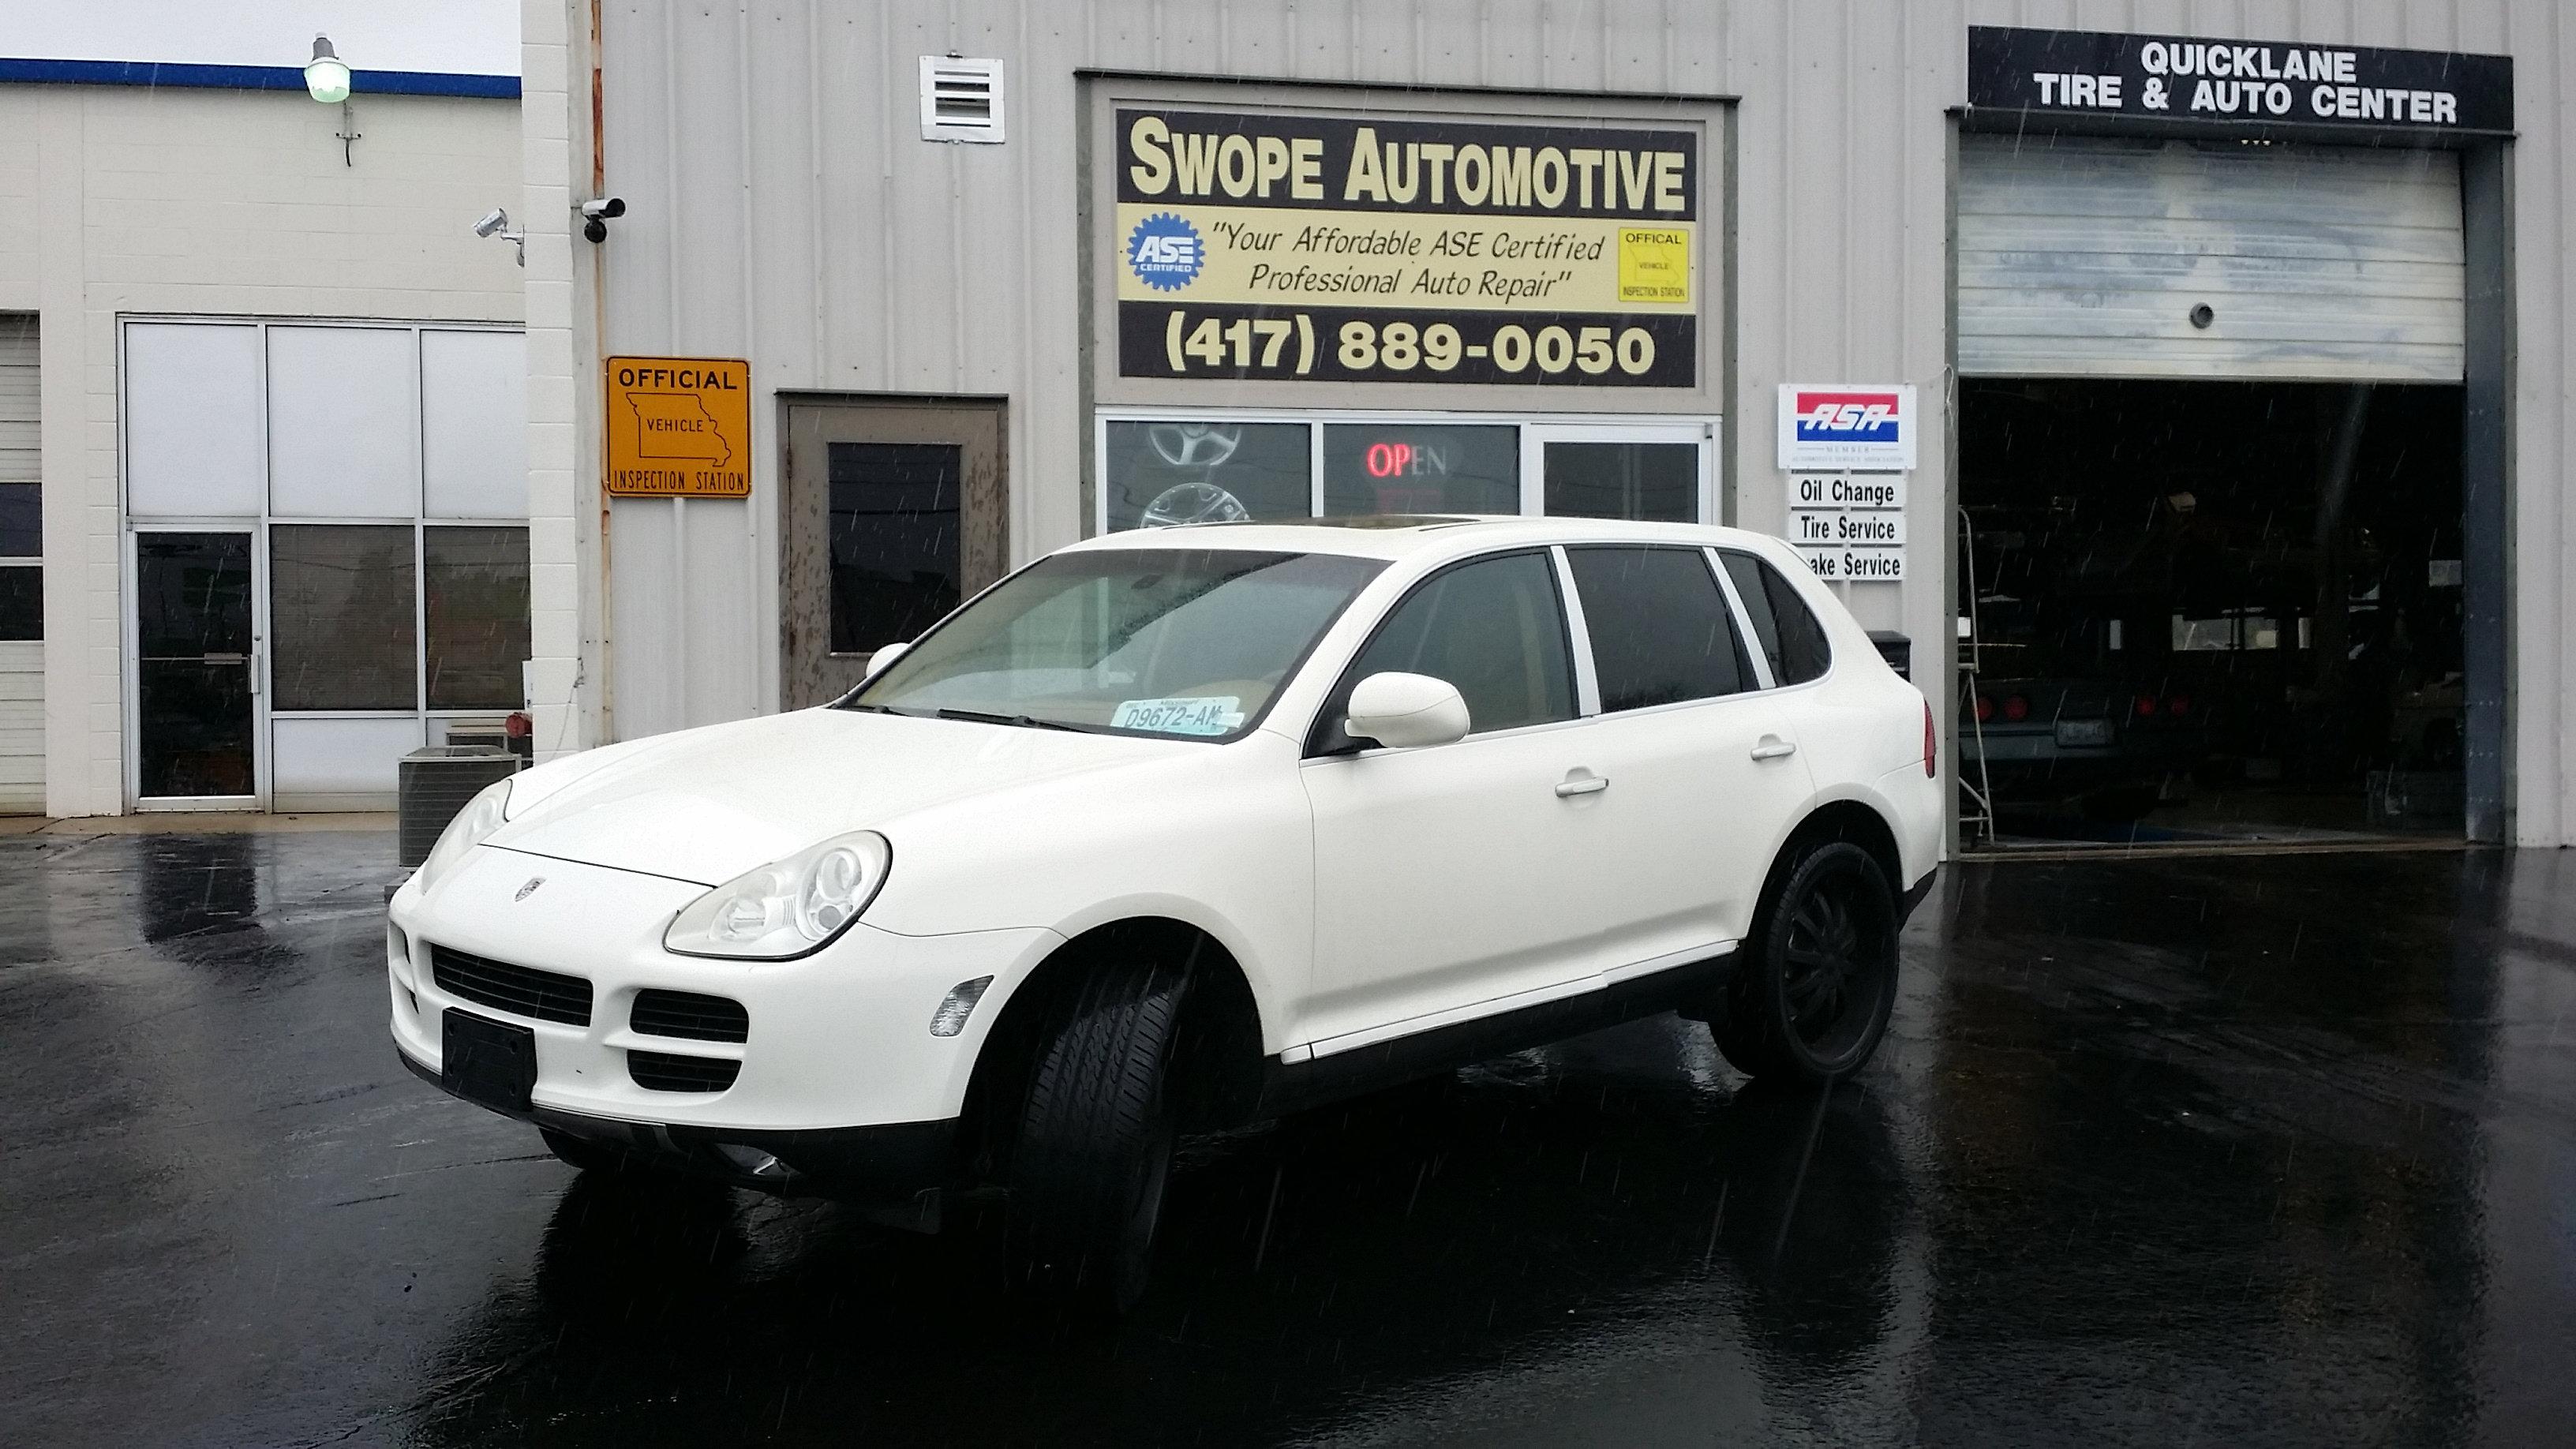 Premier Ase Certified Automotive Repair In Springfield Mo